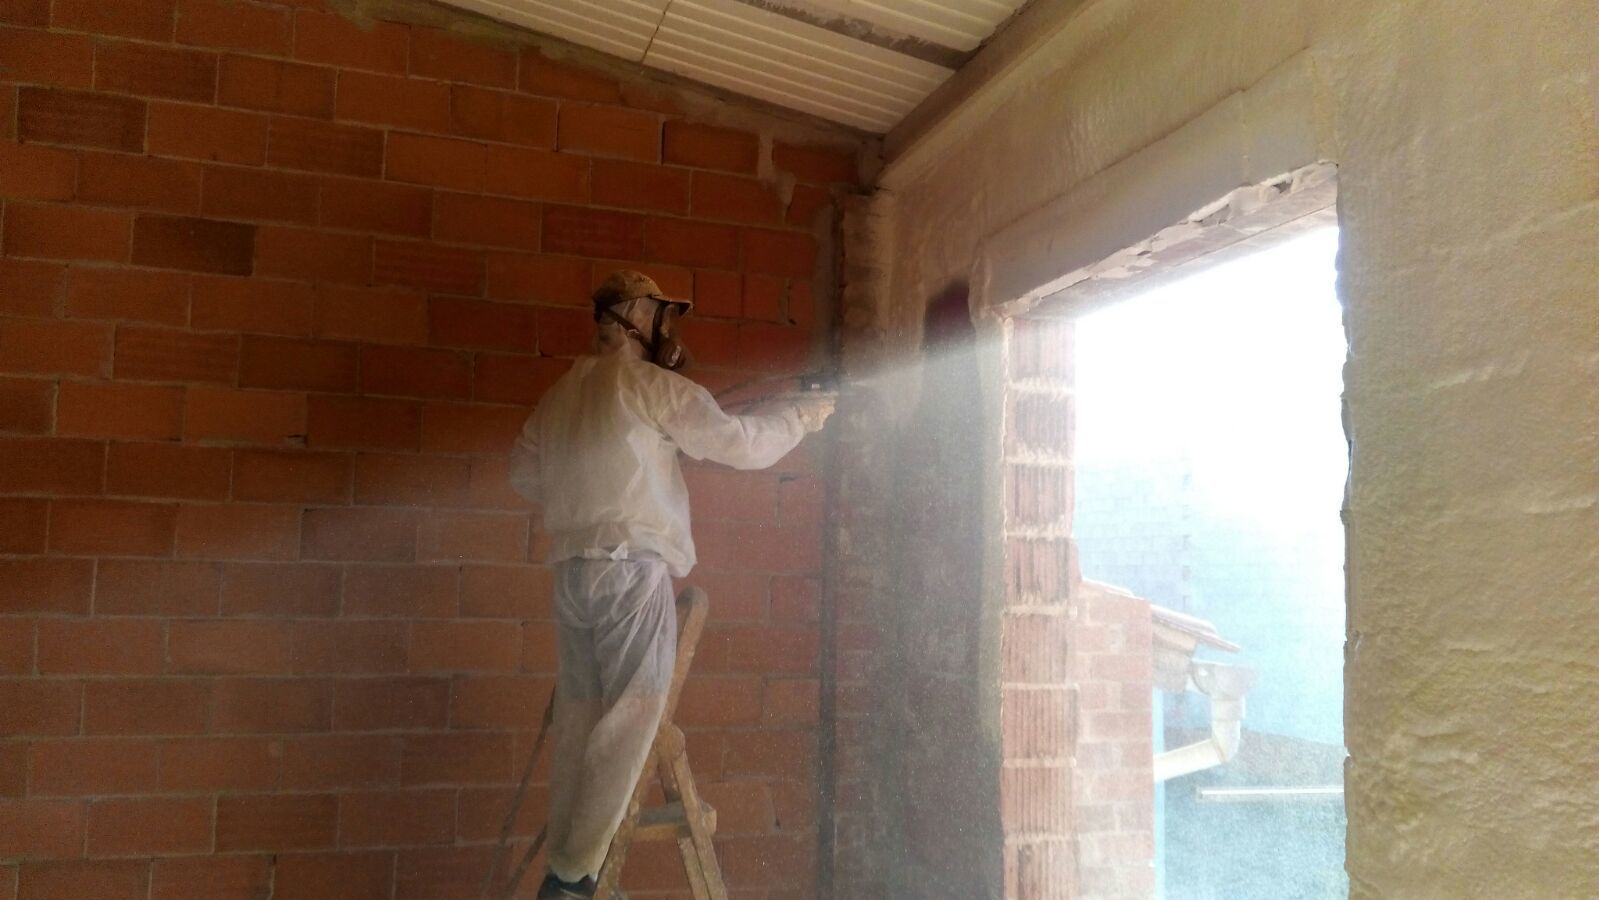 Foto 46 de Aislamientos acústicos y térmicos en Rafelcofer | Aislamientos de Poliuretano Jaime Femenia